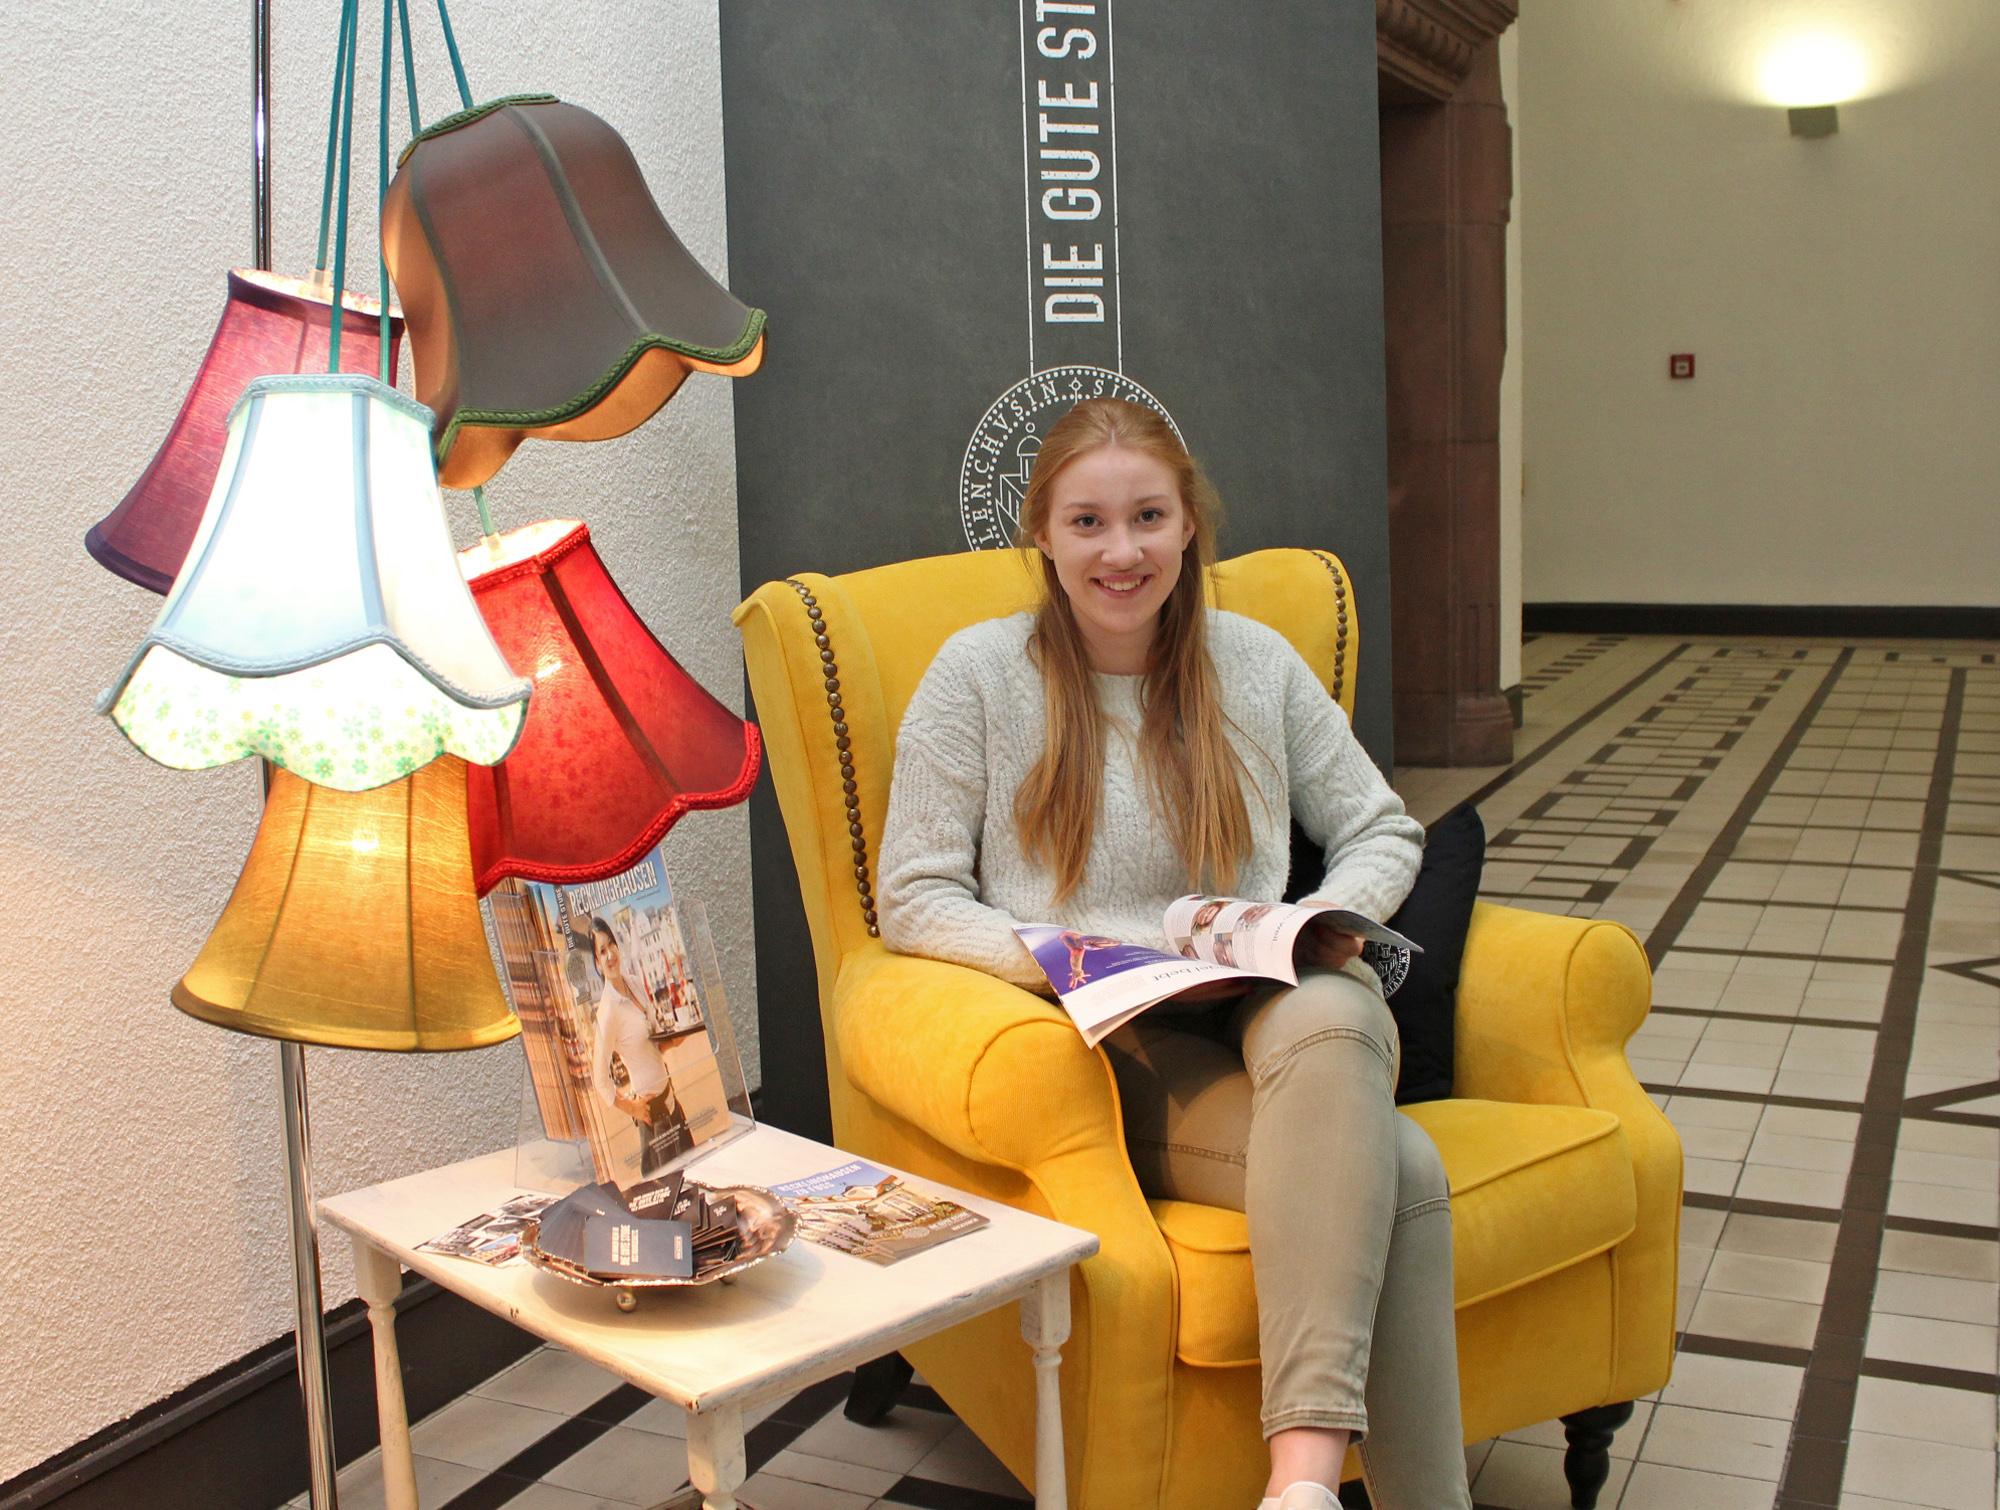 Stadtmarketing-Praktikantin Alicia Müller probiert den Ohrensessel der Info-Ecke aus.